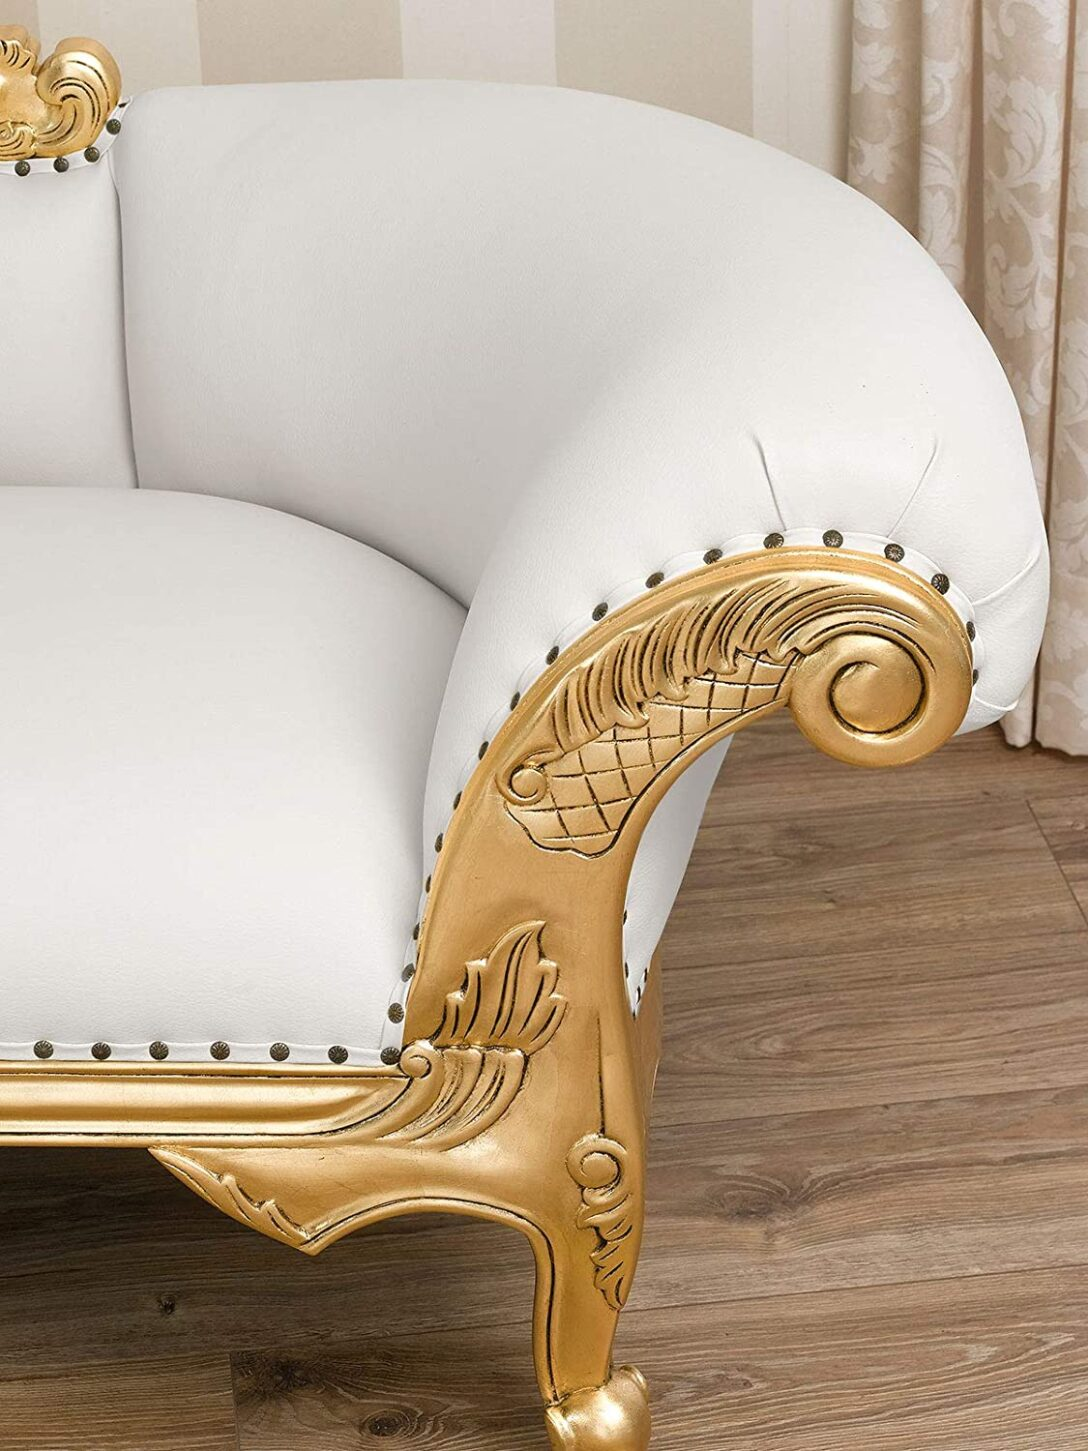 Large Size of Recamiere Barock Diplomatie Chaiselongue Boudoir Rot Simone Guarracino Franzsischer Stil Bett Sofa Mit Wohnzimmer Recamiere Barock